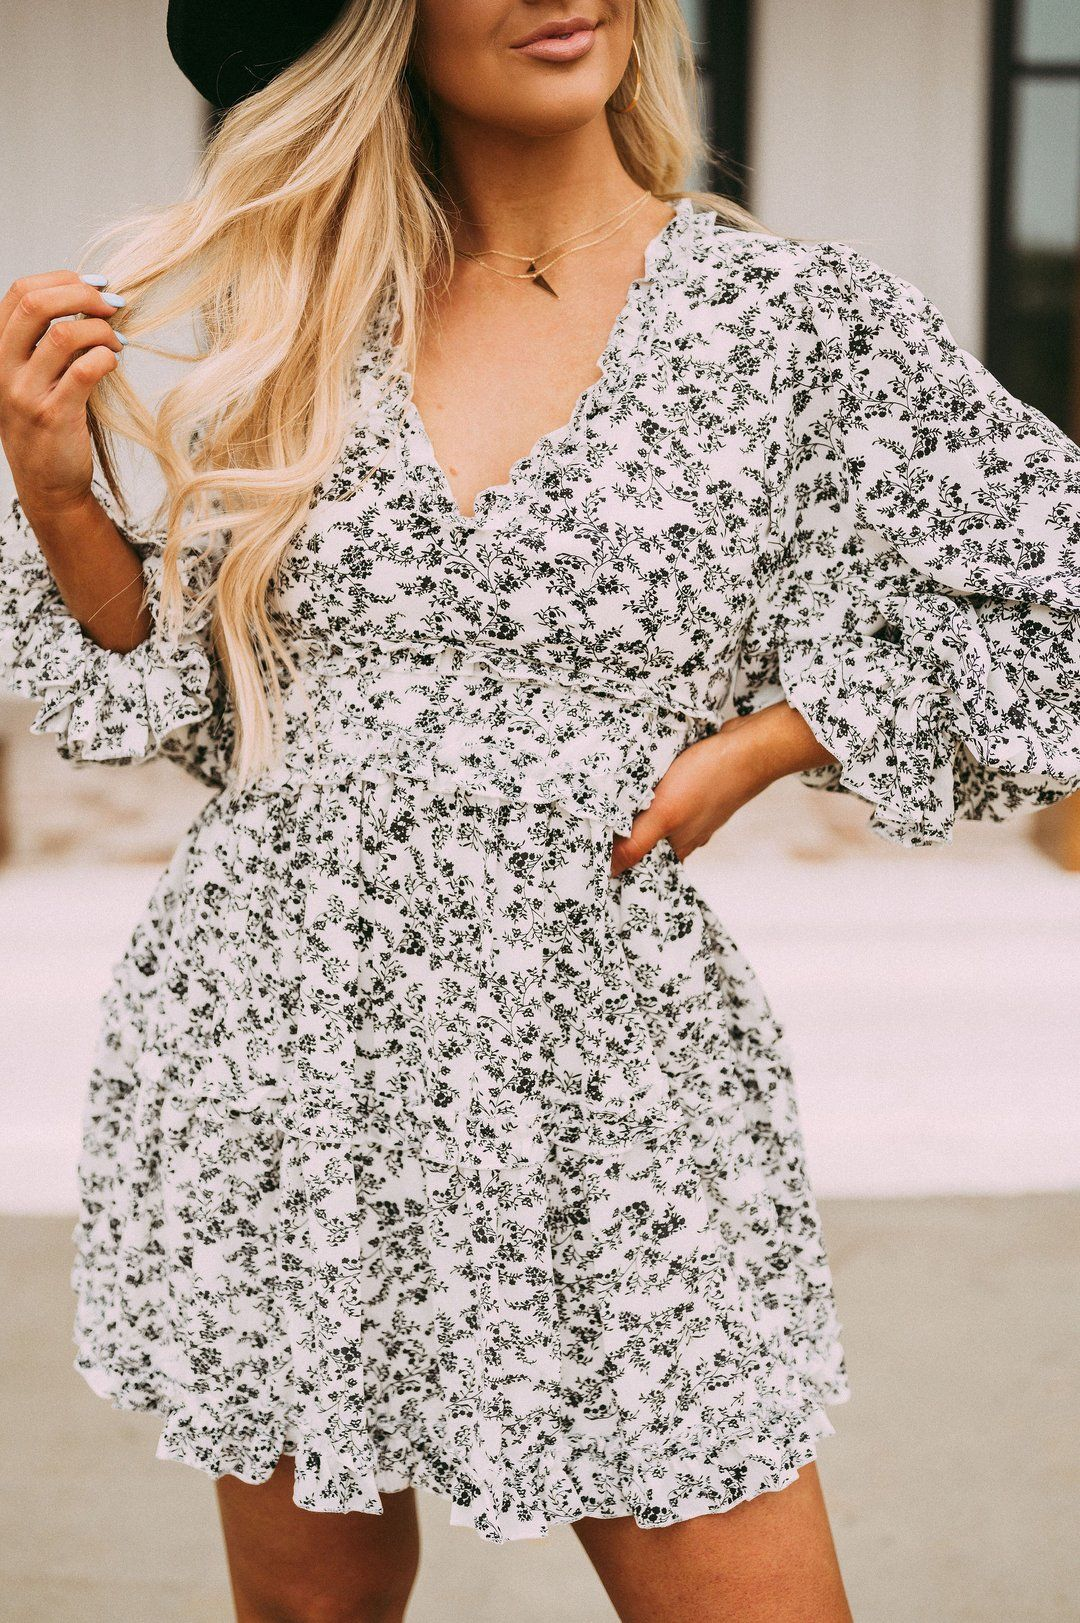 Black And White Floral Print Dress Featuring A V Neckline Ballon Sleeves A Ruffled Bottom Hem And An Ope White Floral Print Dress Dresses Floral Print Dress [ 1623 x 1080 Pixel ]